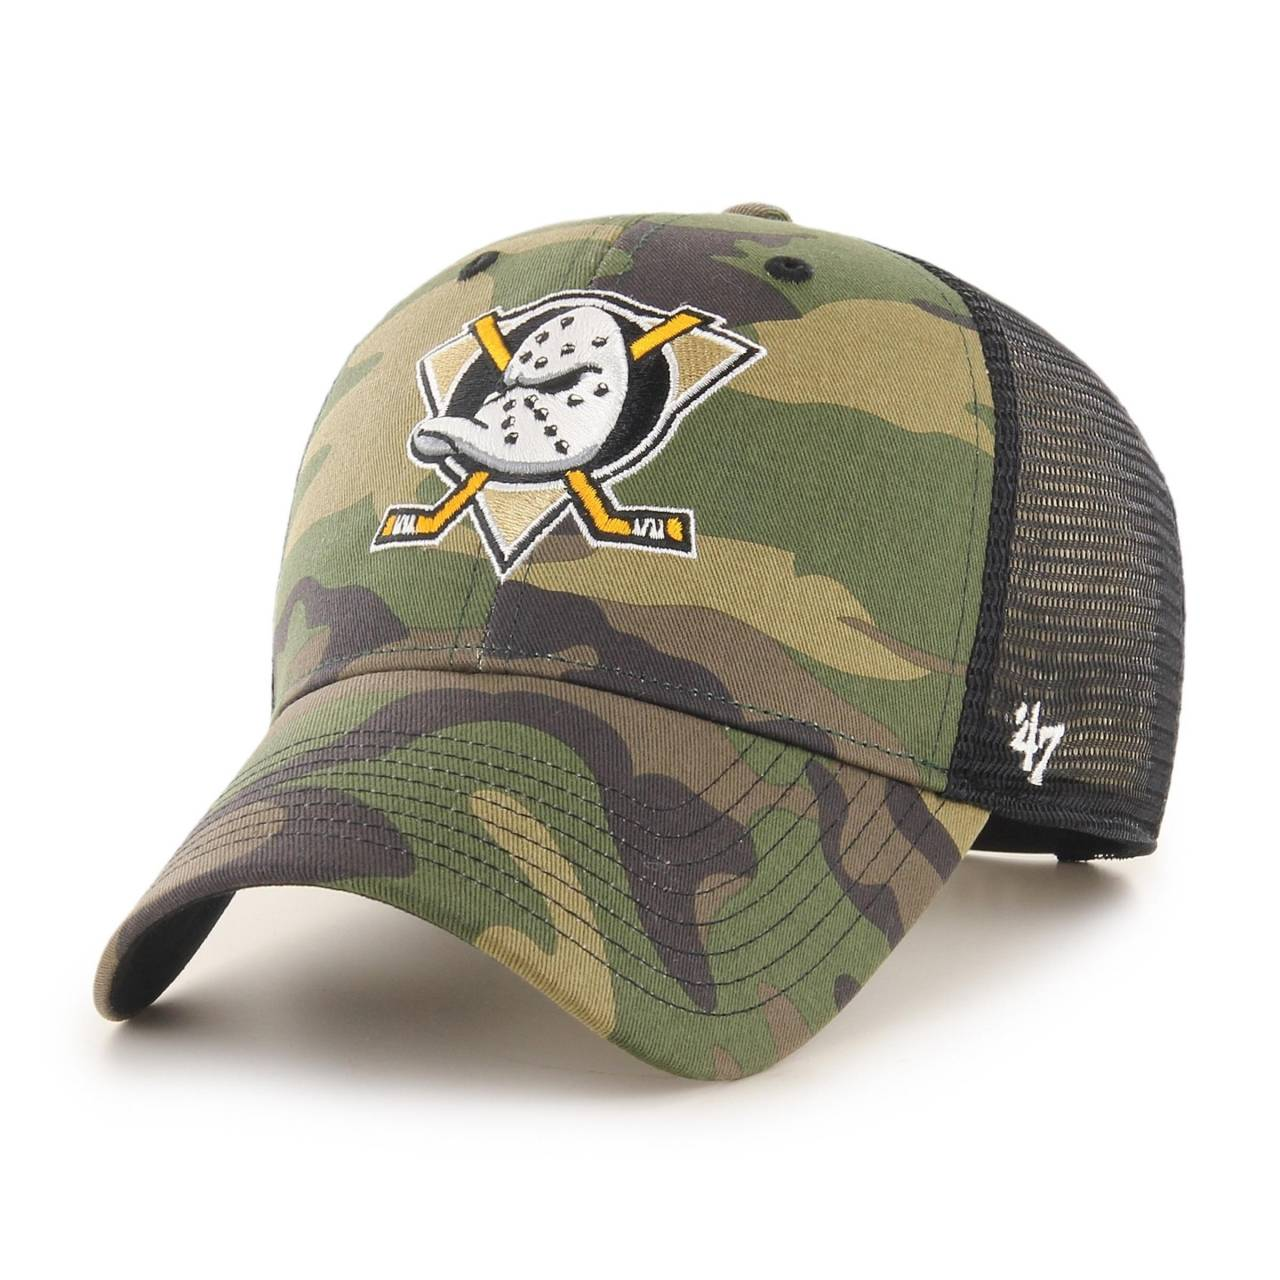 NHL ANAHEIM DUCKS CAMO BRANSON '47 MVP CAP